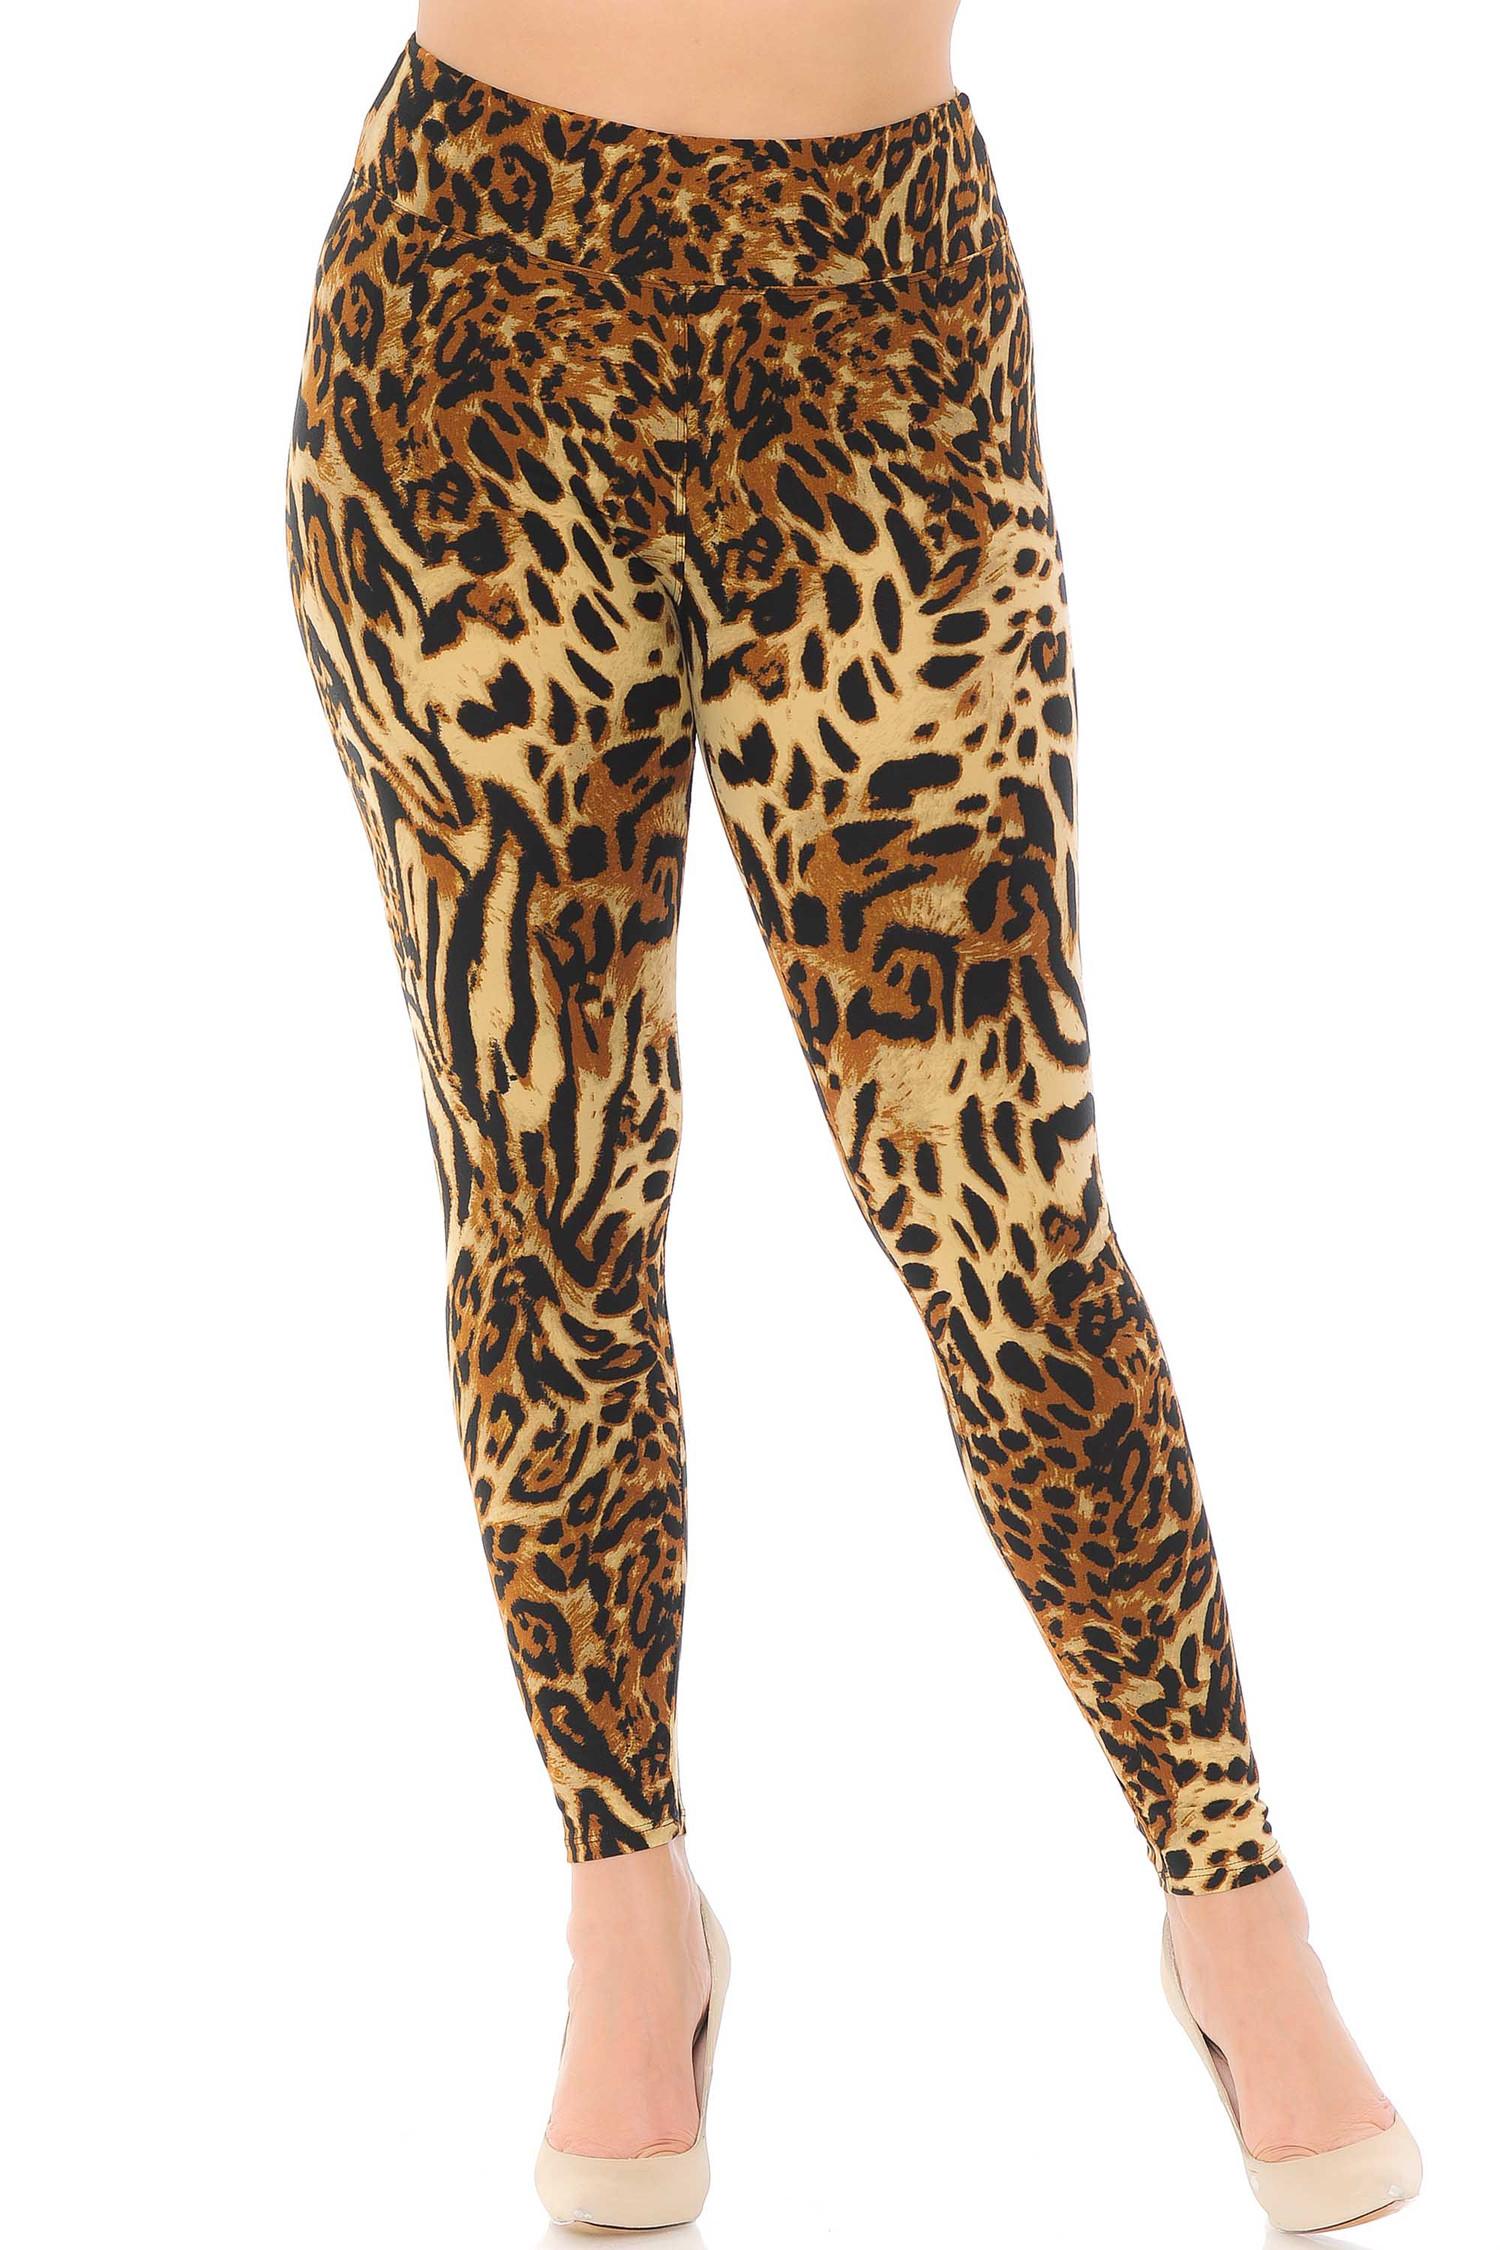 Brushed  Predator Leopard High Waisted Plus Size Leggings